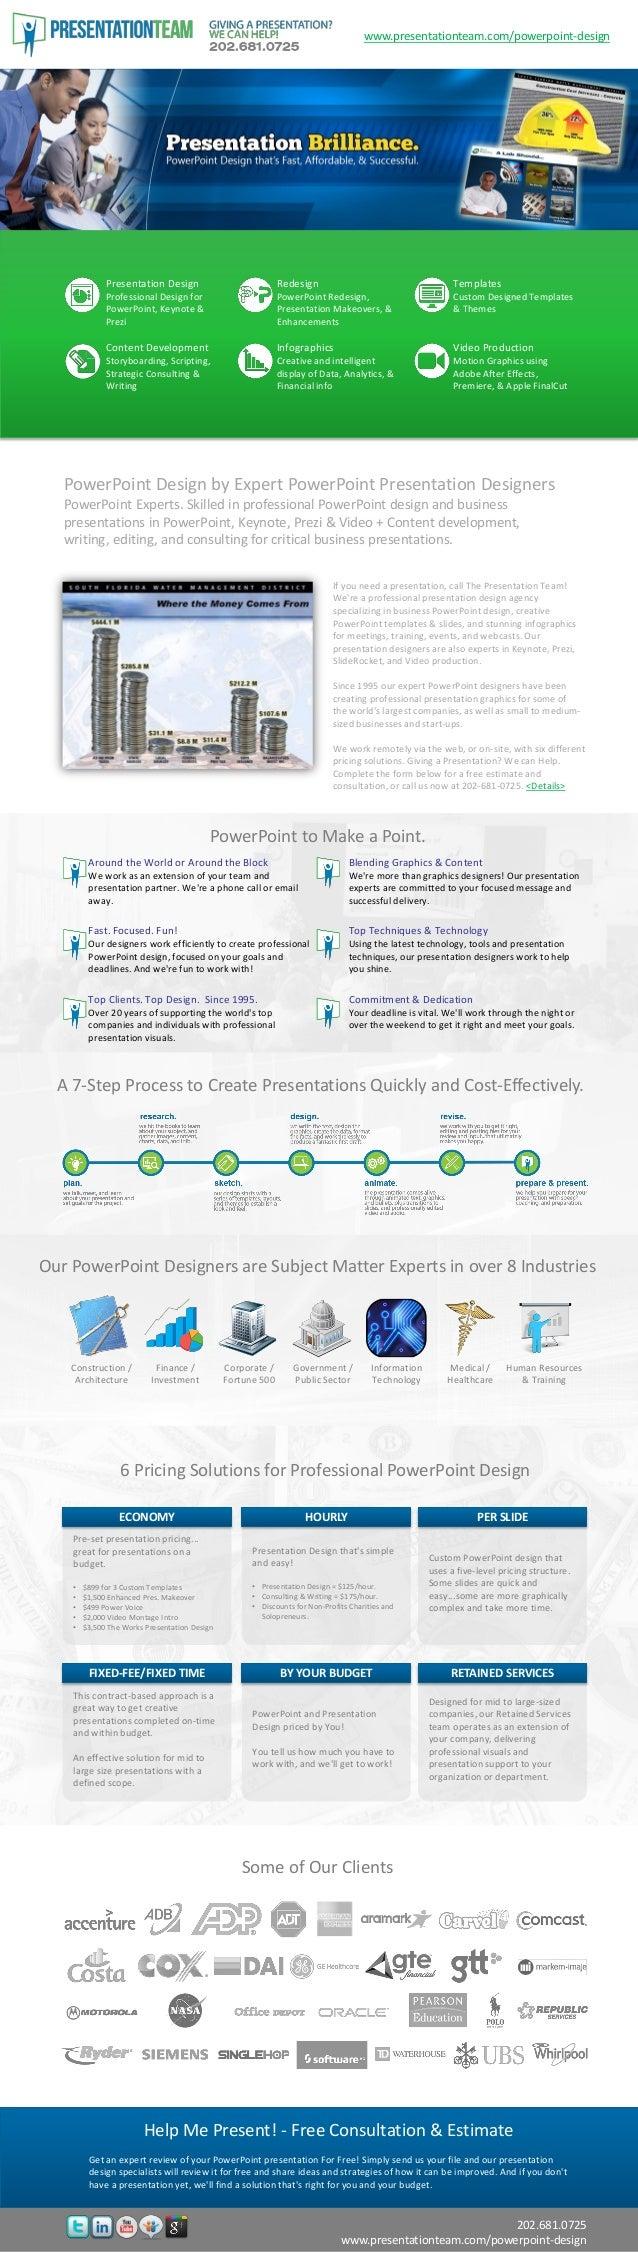 Presentation Design Professional Design for PowerPoint, Keynote & Prezi Redesign PowerPoint Redesign, Presentation Makeove...